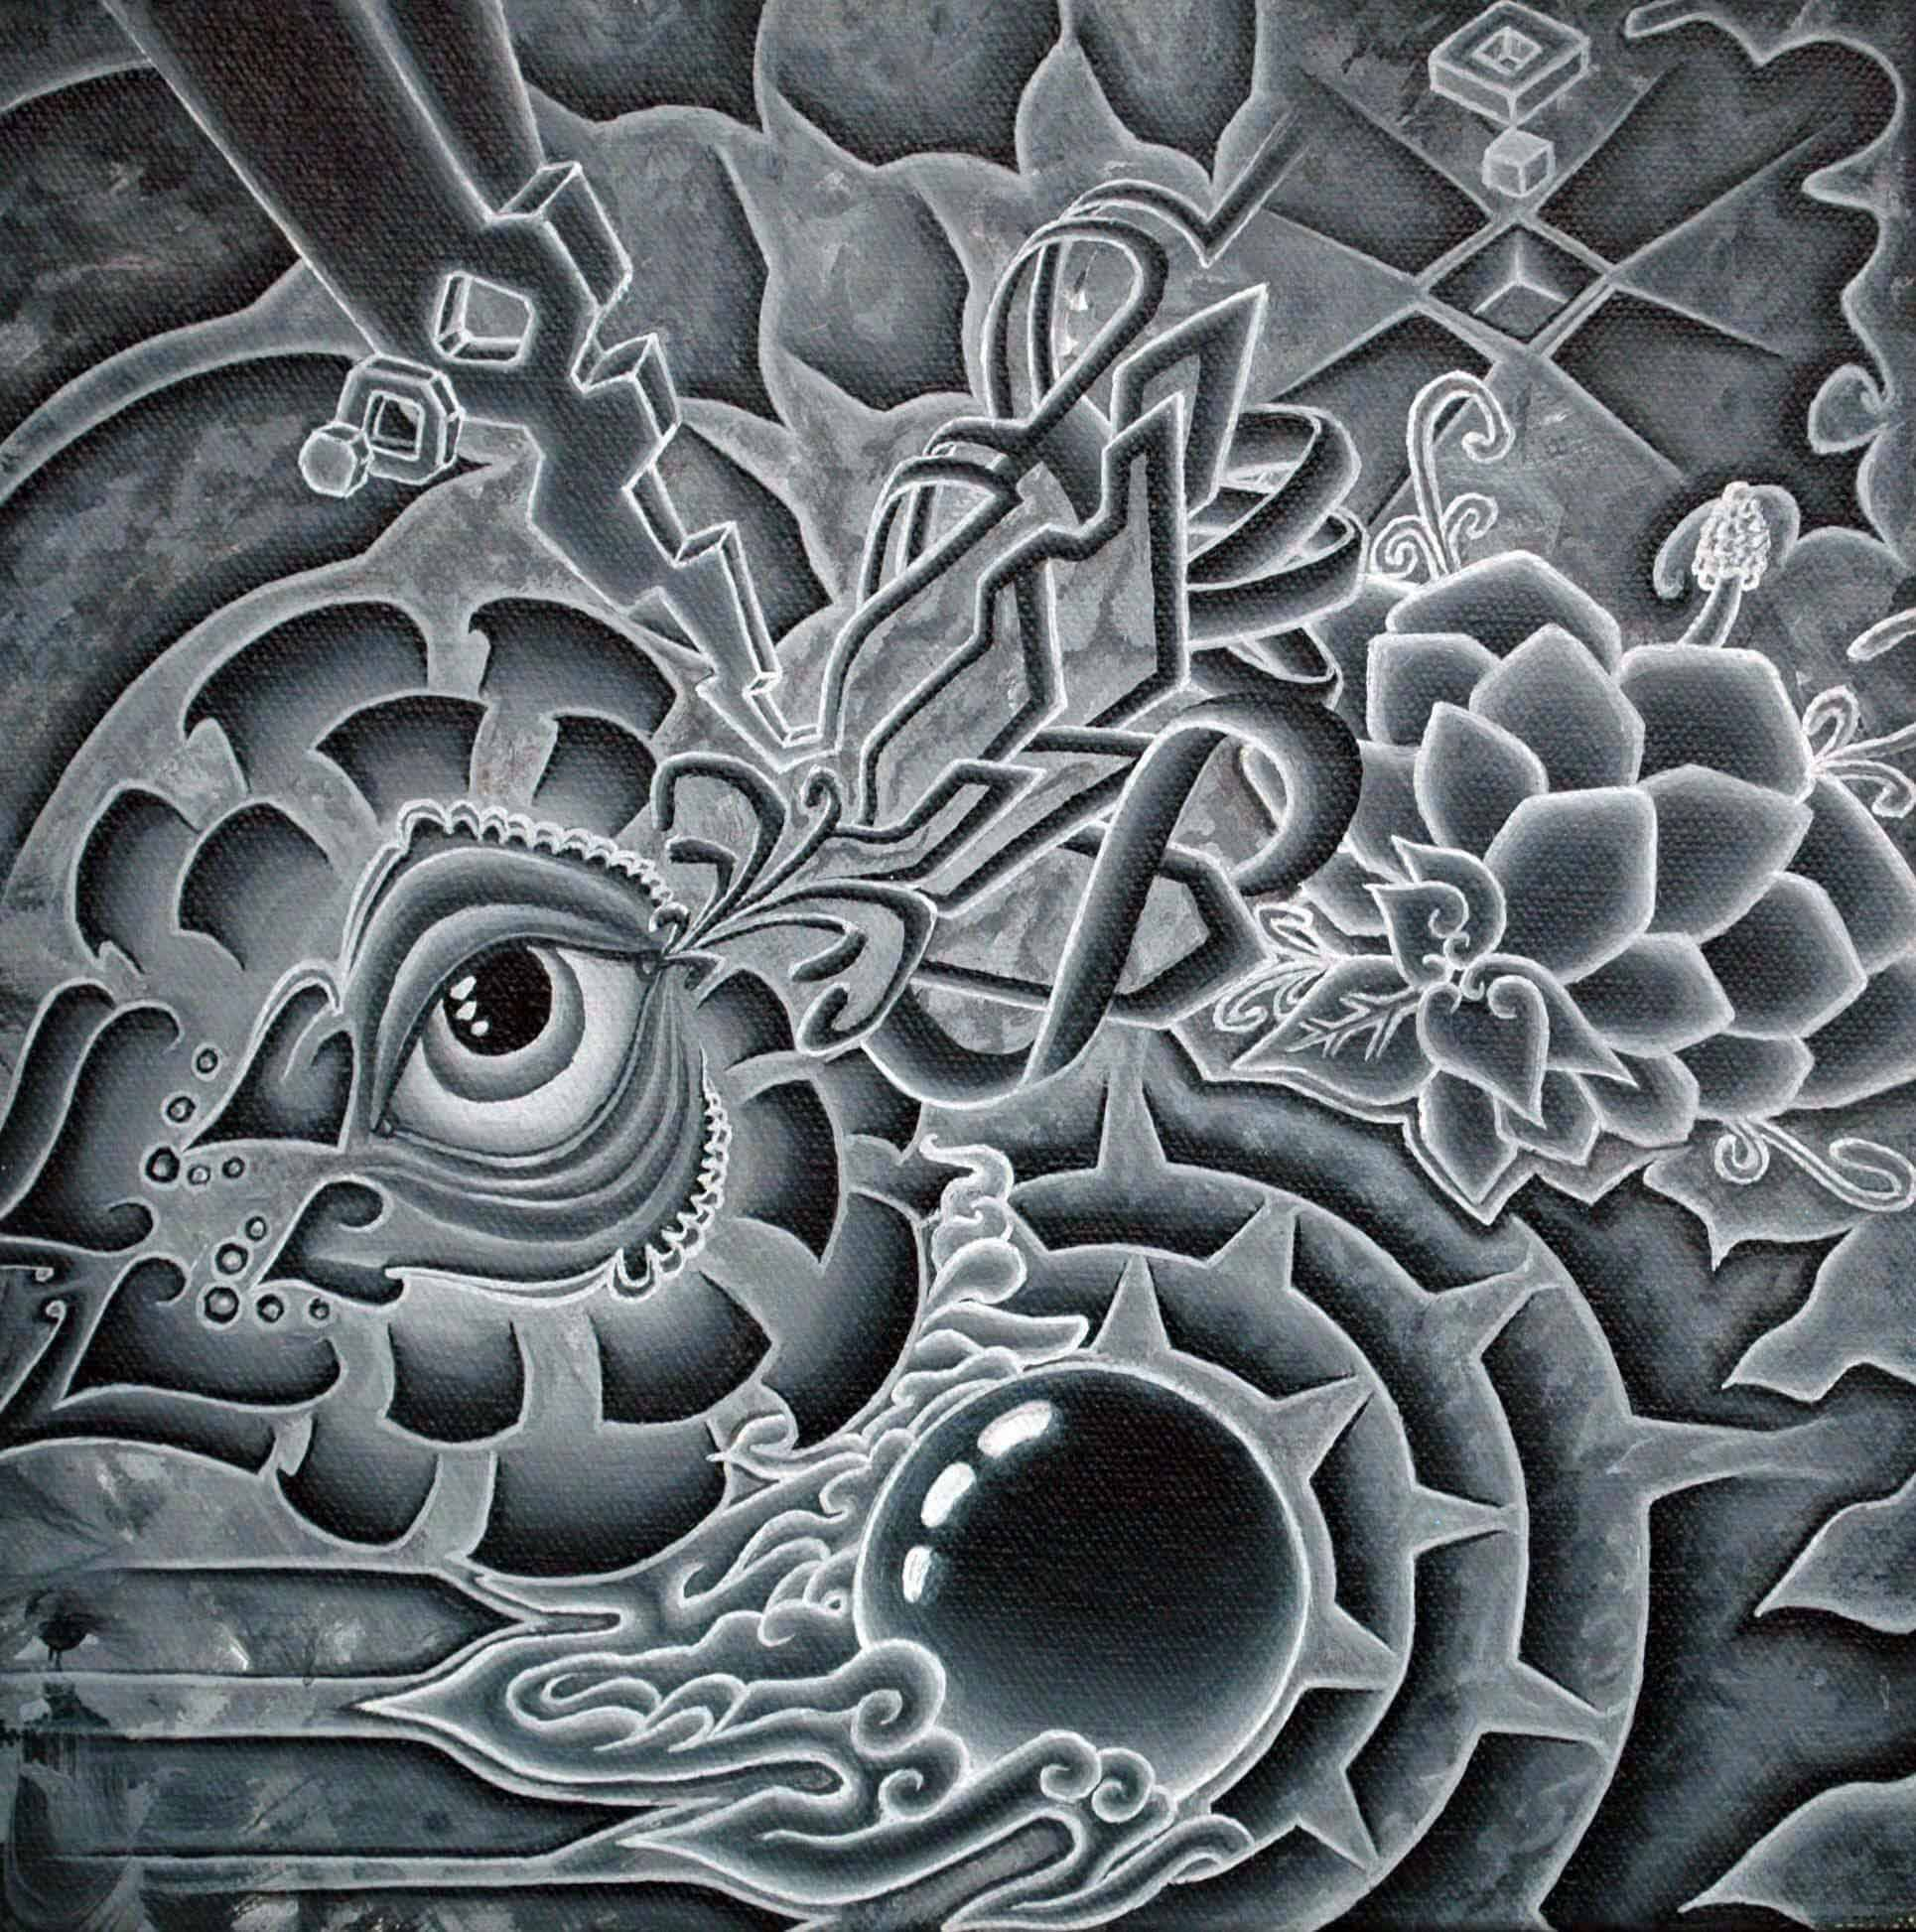 Johnny Stinson Art _ Graffitiseed.com